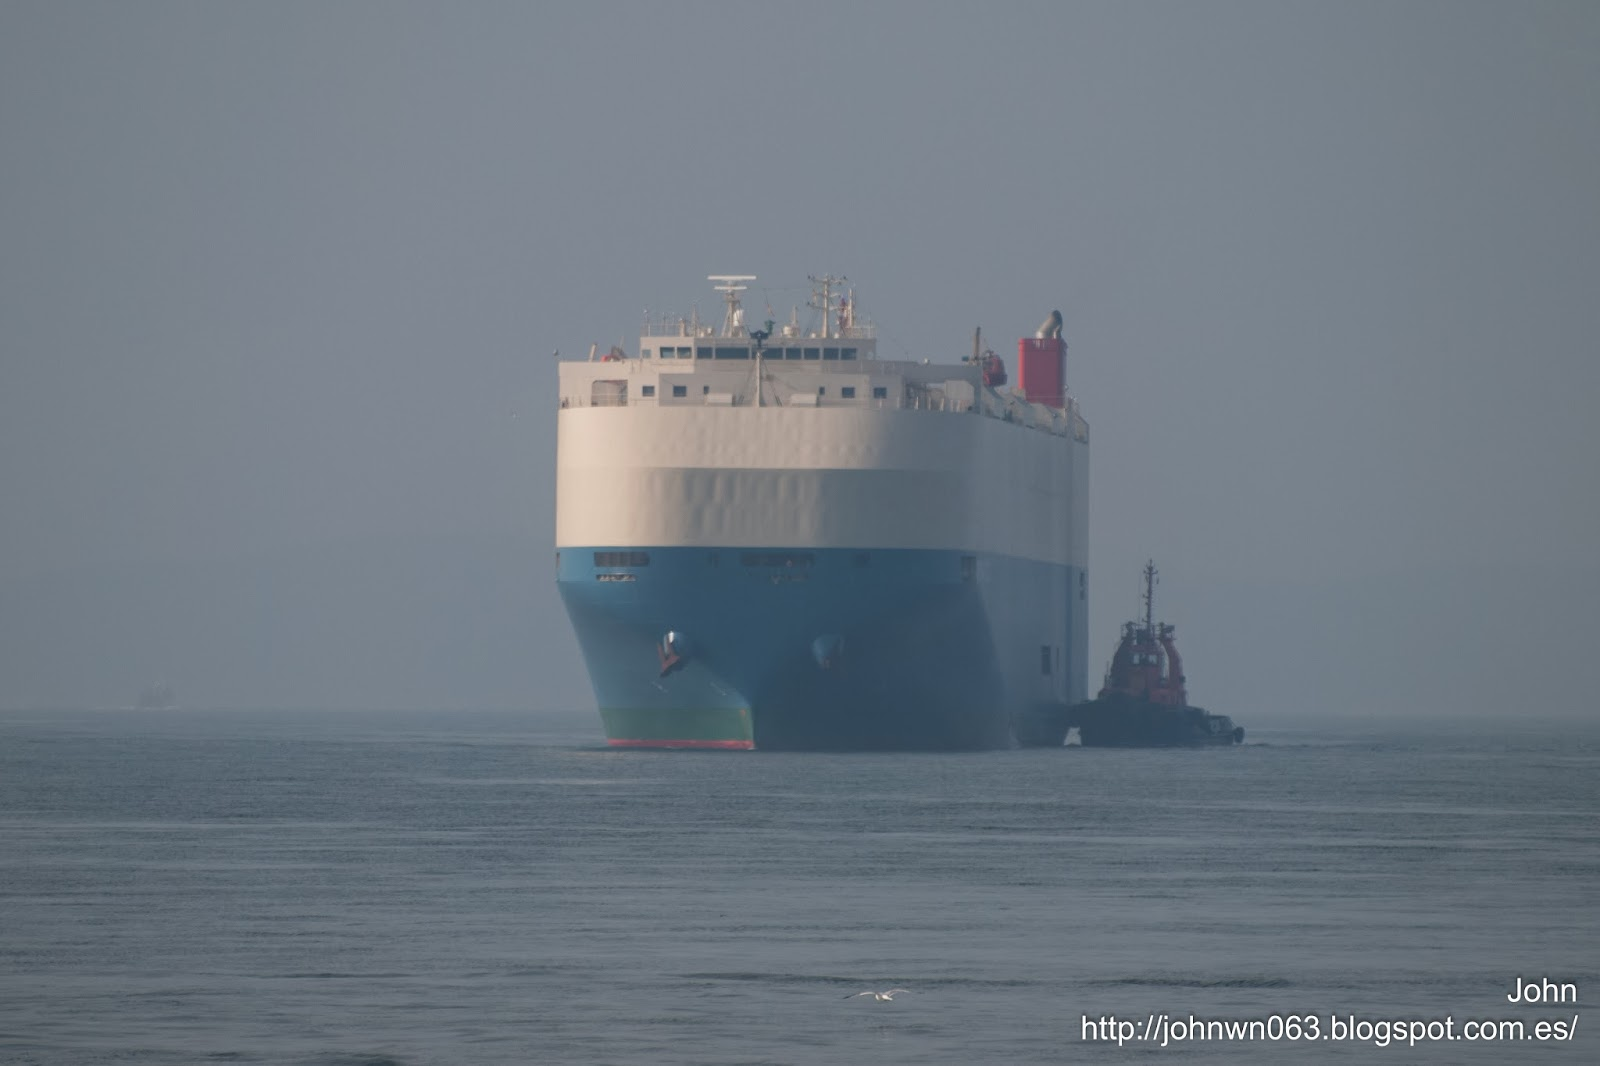 mermaid ace, ro-ro, fotos de barcos, vehicles carrier, bouzas